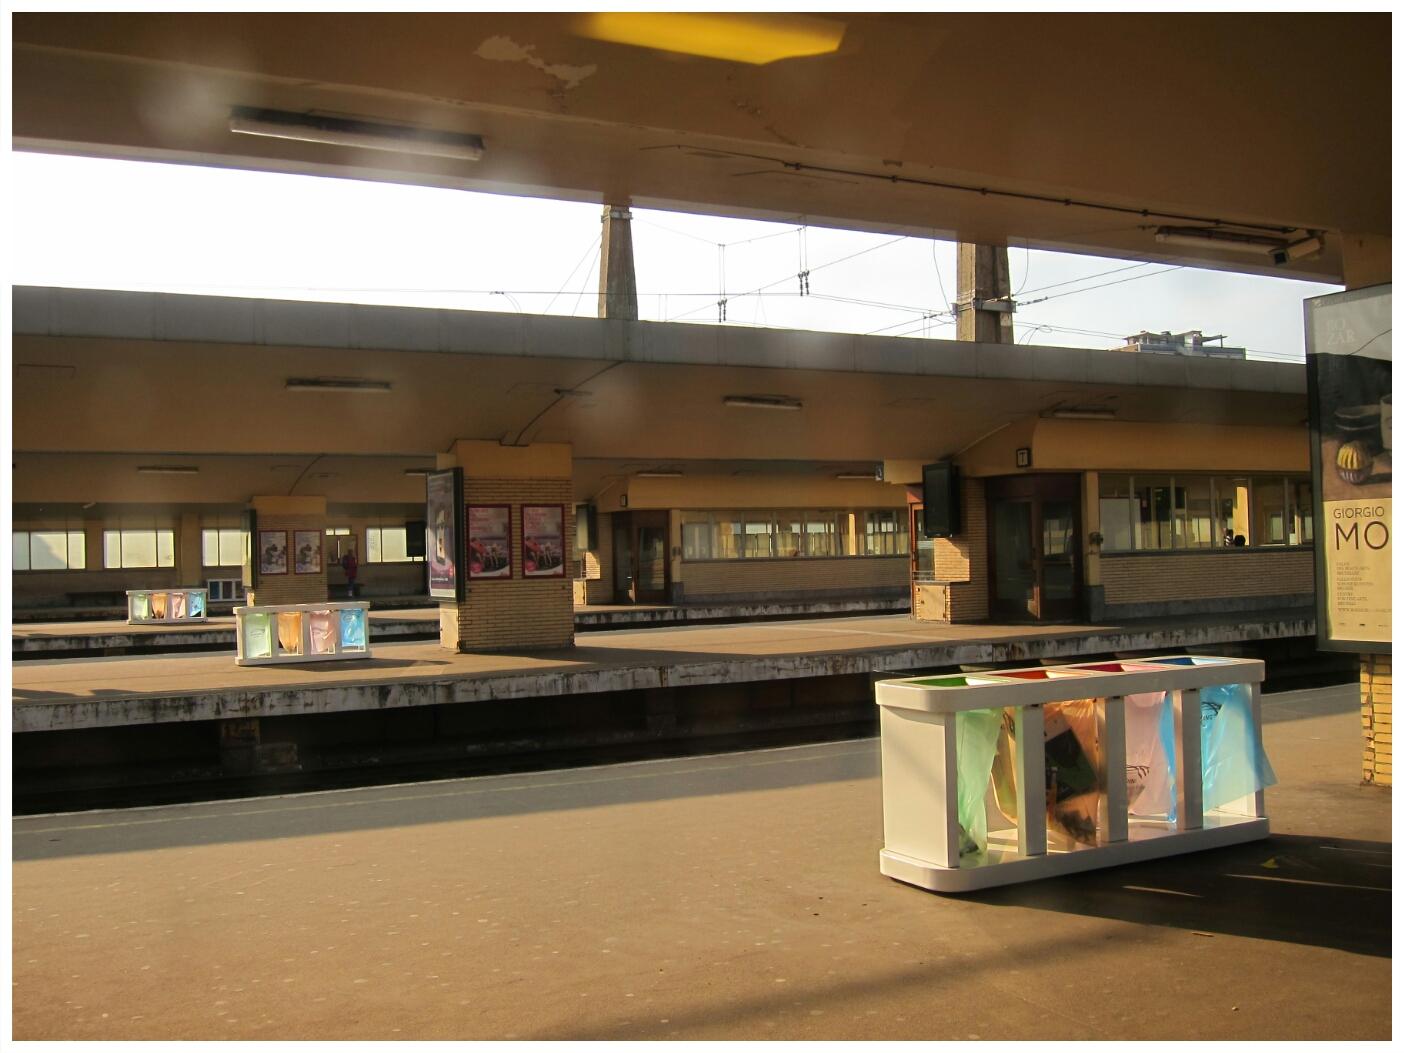 Bahnhofsglühn